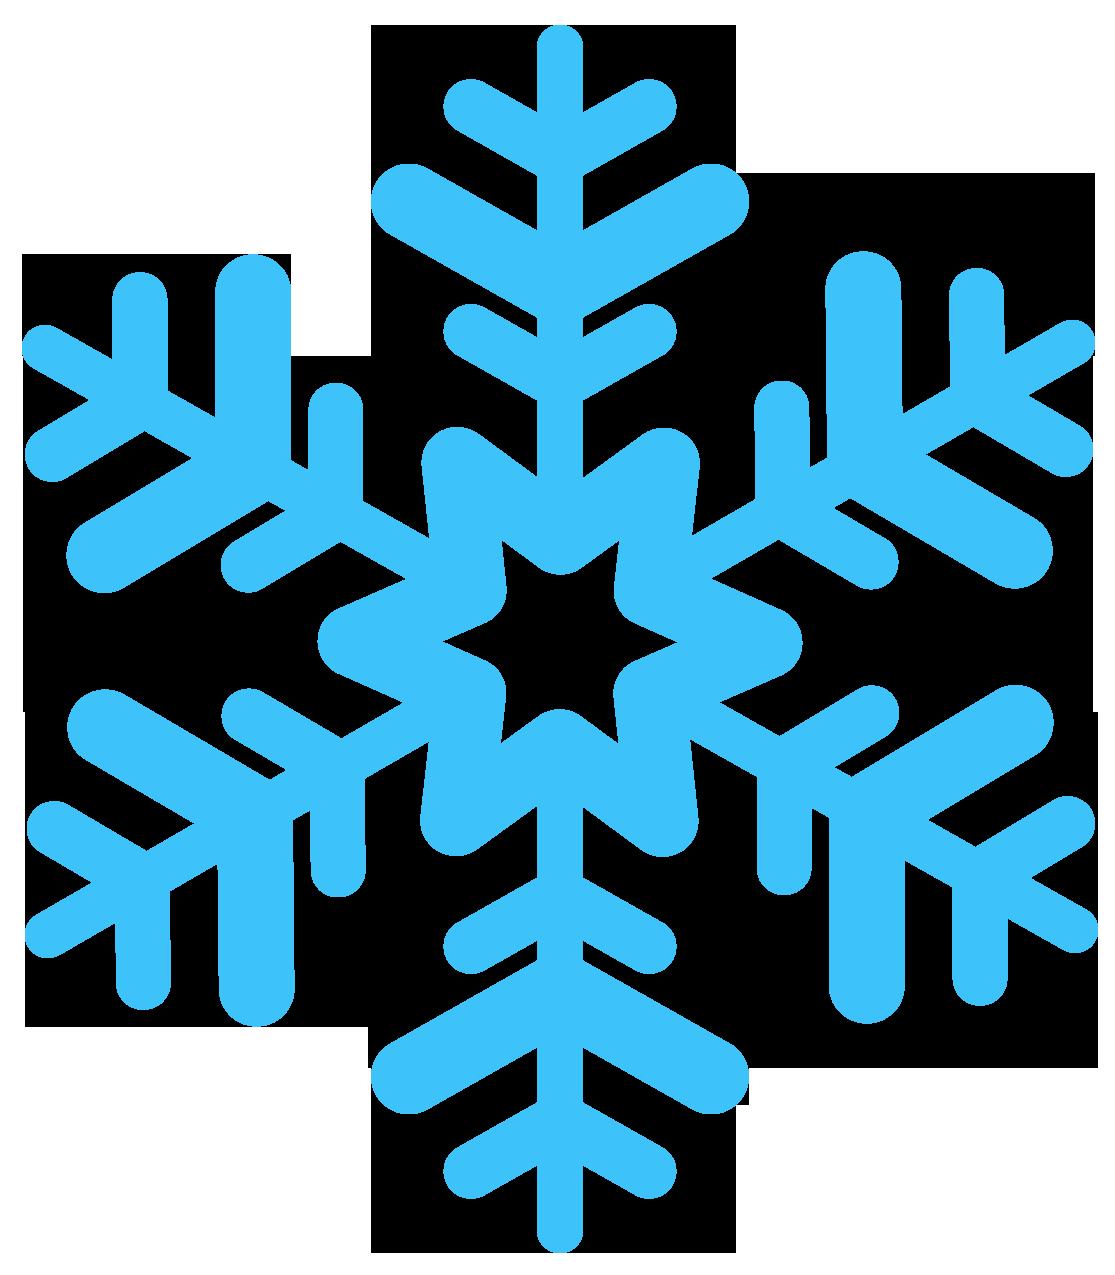 Snowflakes PNG - 6142